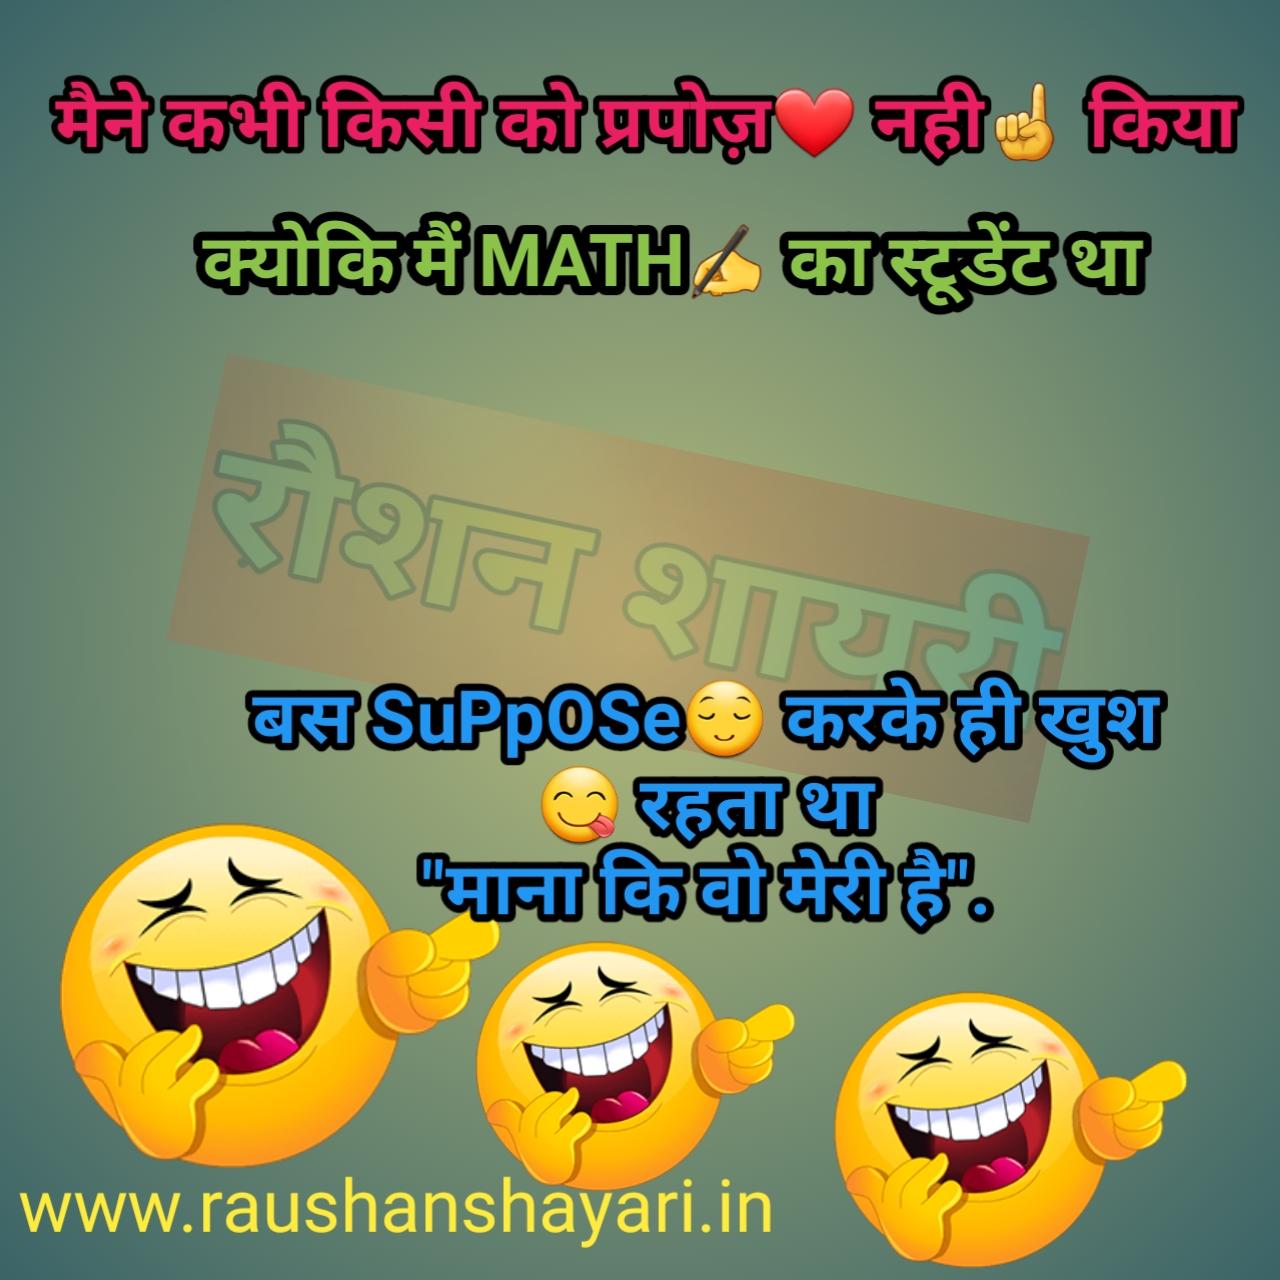 Majak tak #2 मजाक तक टाइम पास Whatsapp status image 2020 funny joke raushan shayari